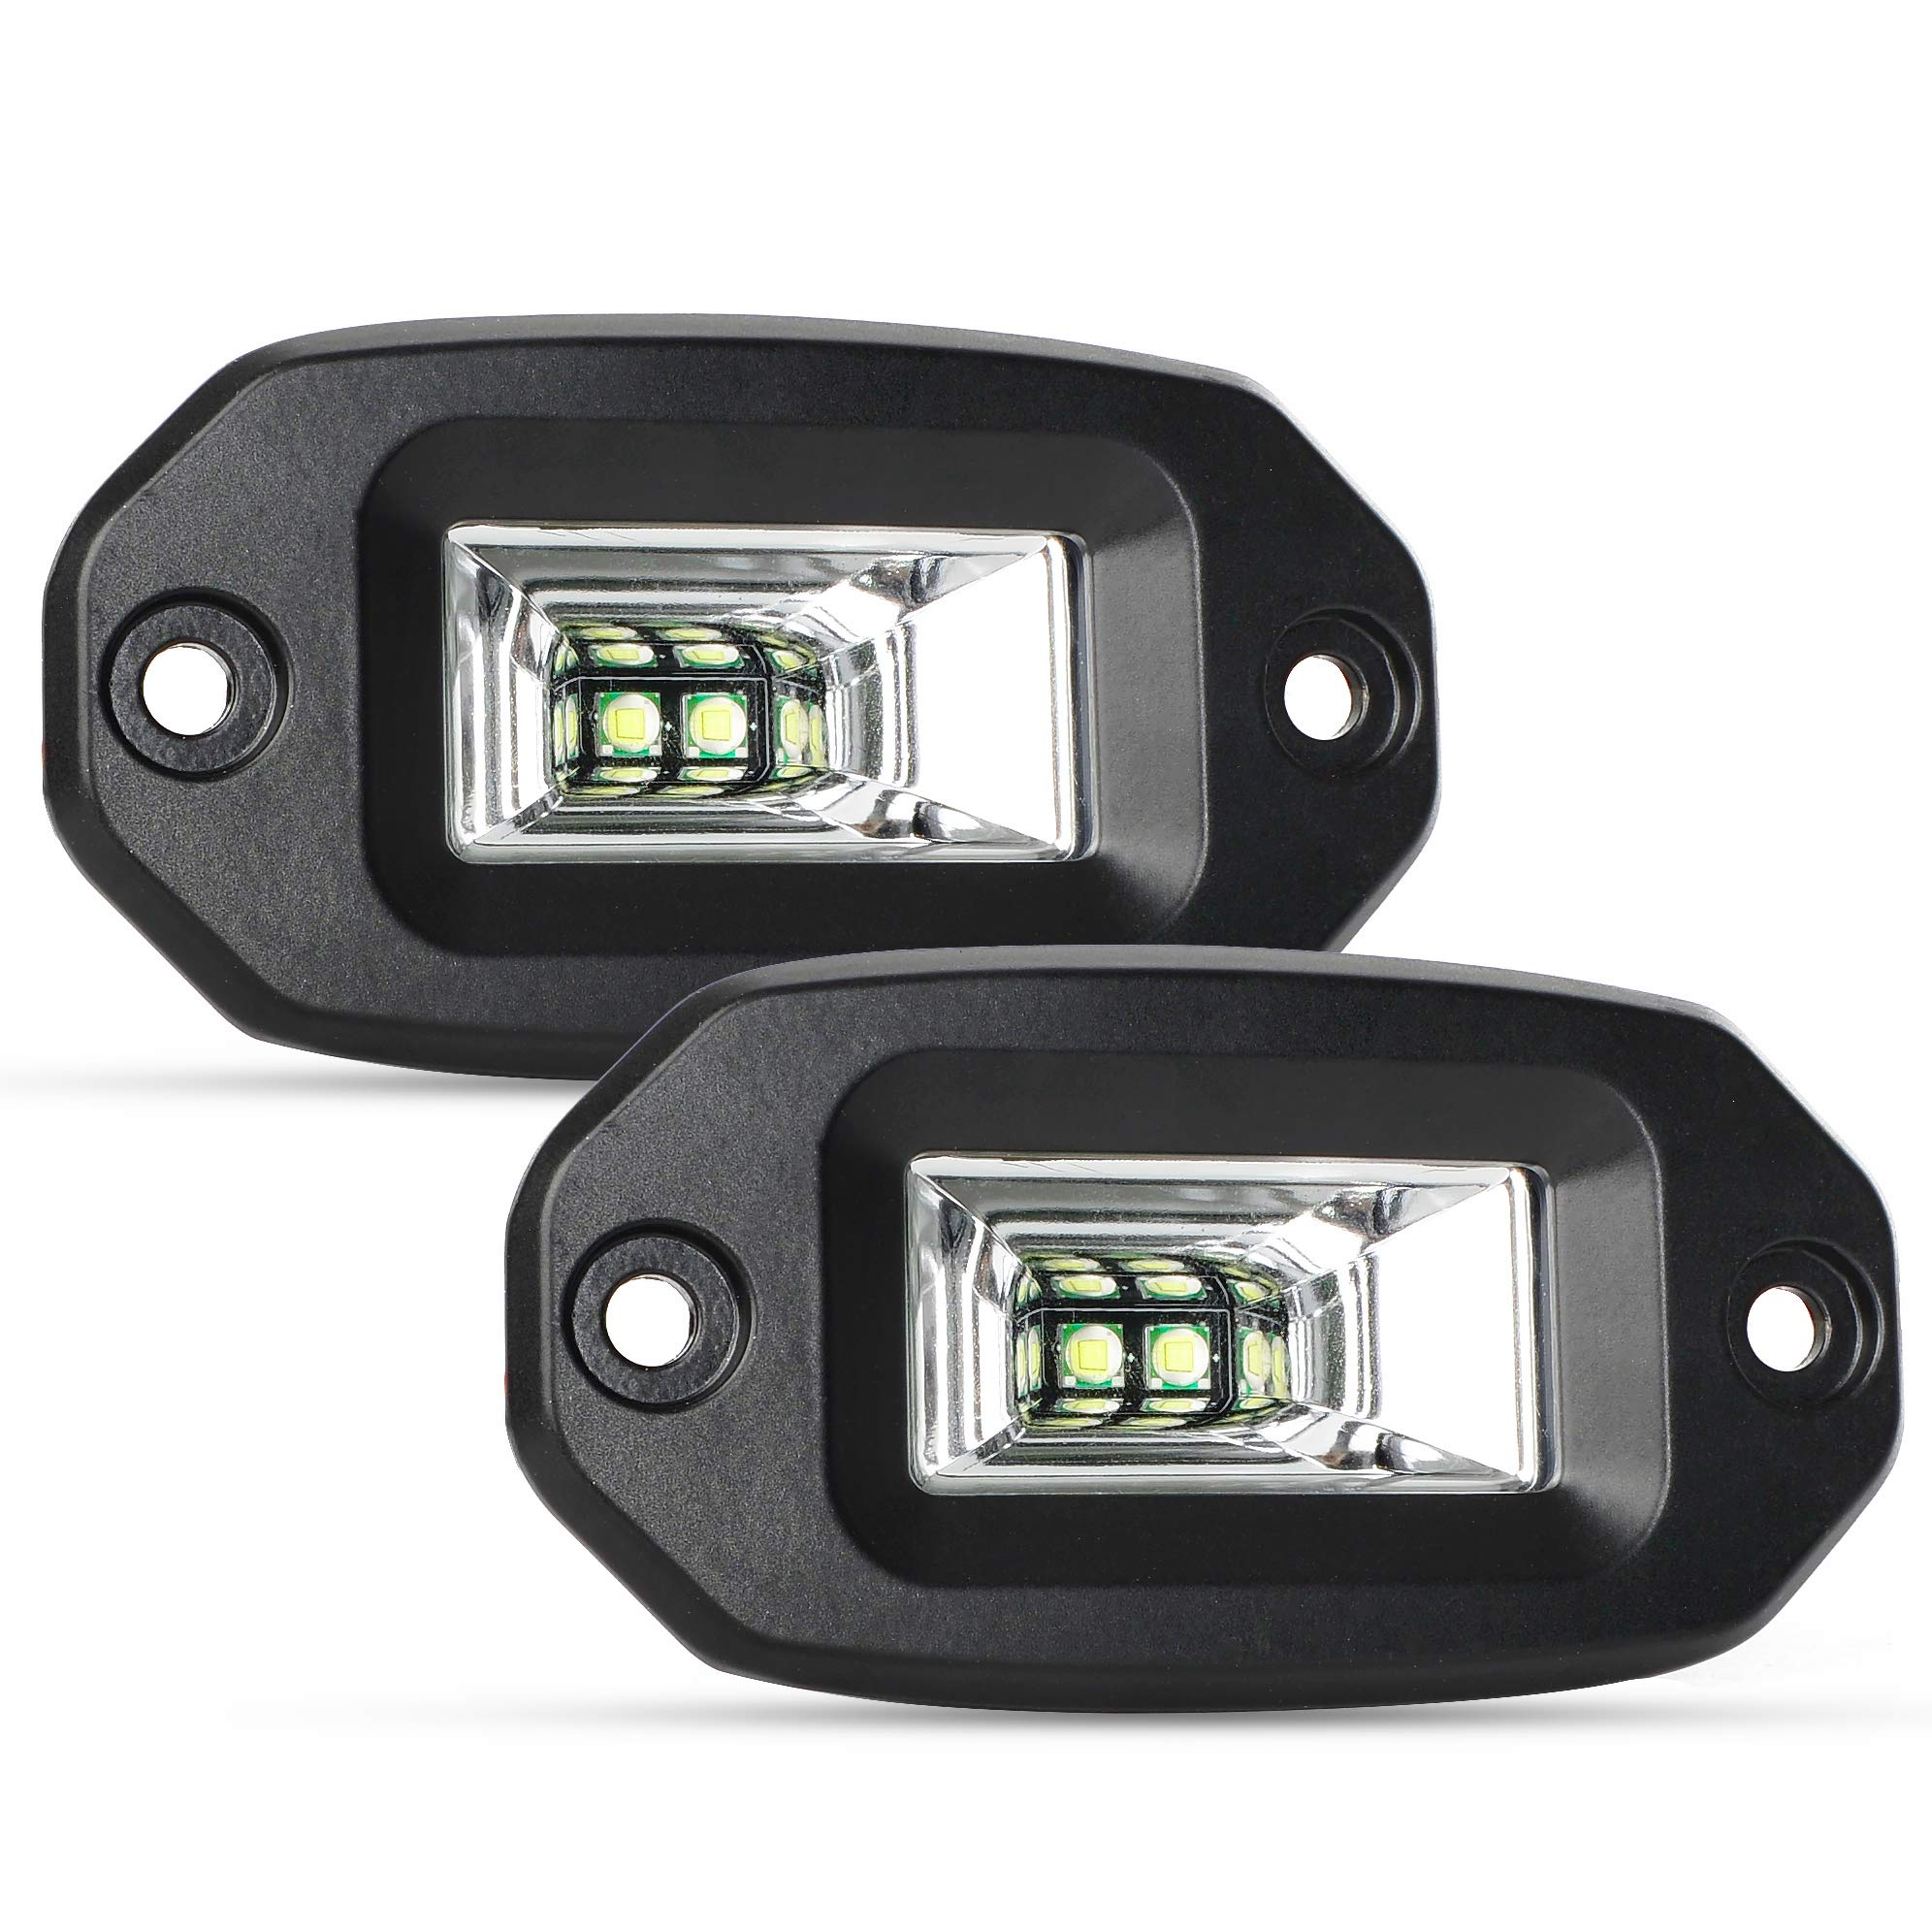 Spot Flood Combo Beam Driving Fog Lamps 1920LM 24W OSRAM LED Light Bar Off Road Work Light MICTUNING Unlimited-GO 4 Inch Quad Row LED Pods 2 Packs